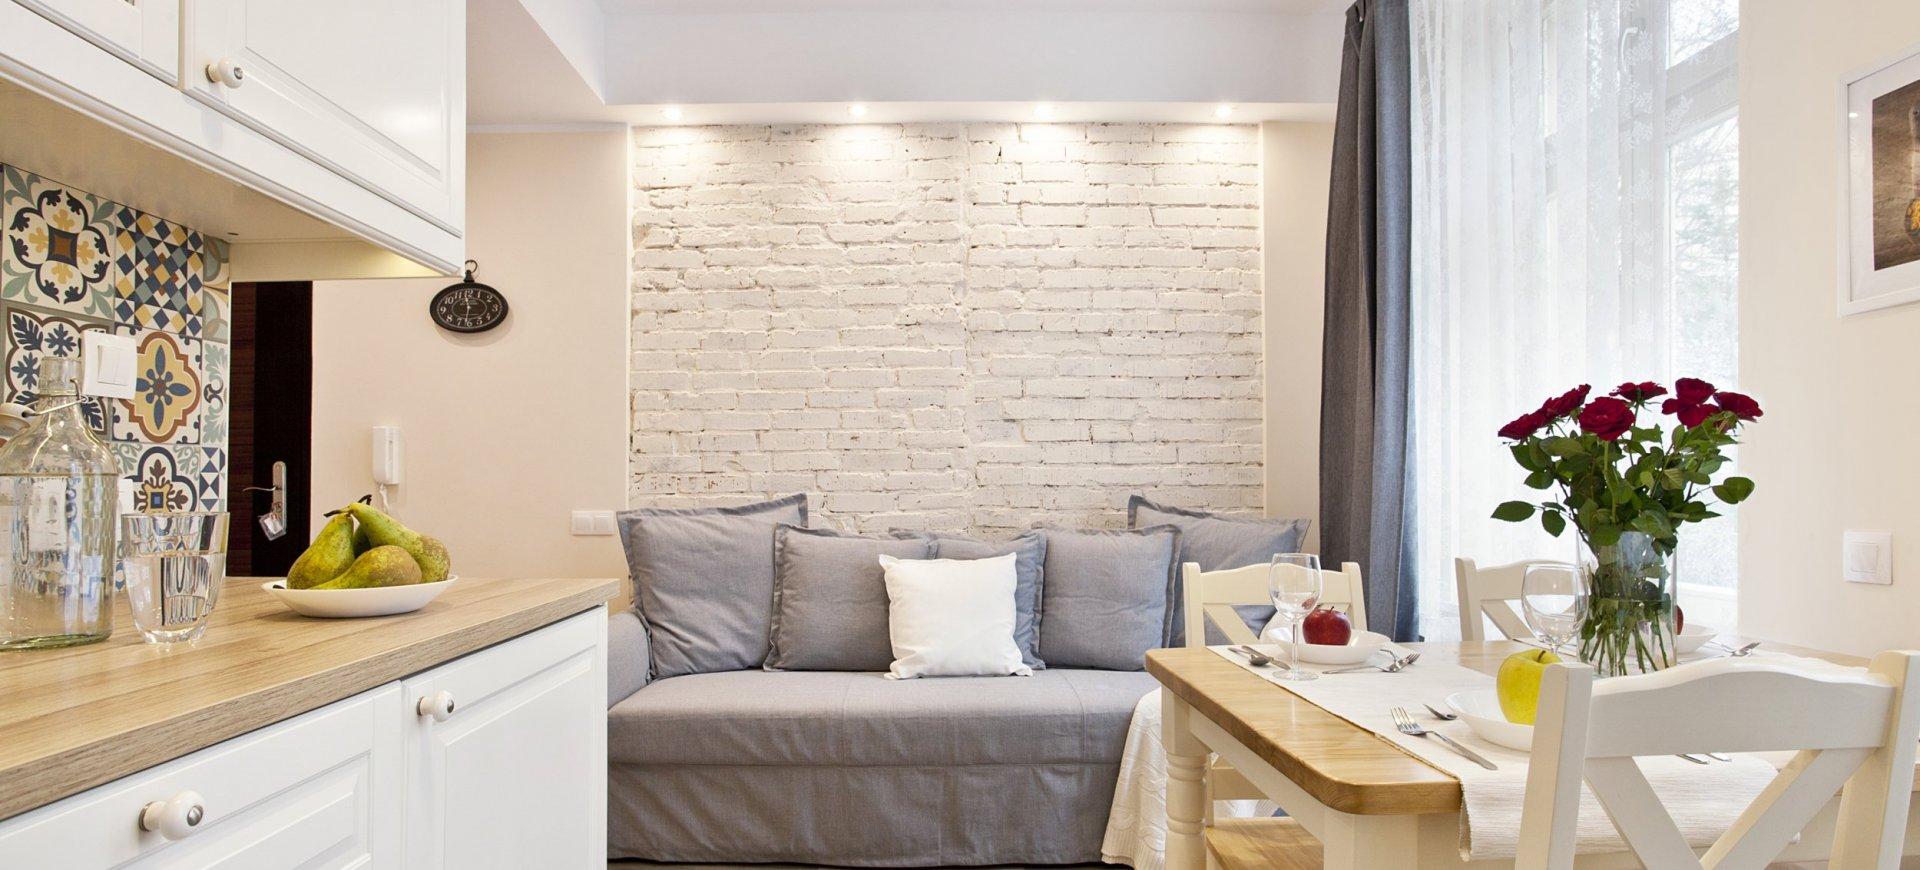 Apartament Vintage 1A